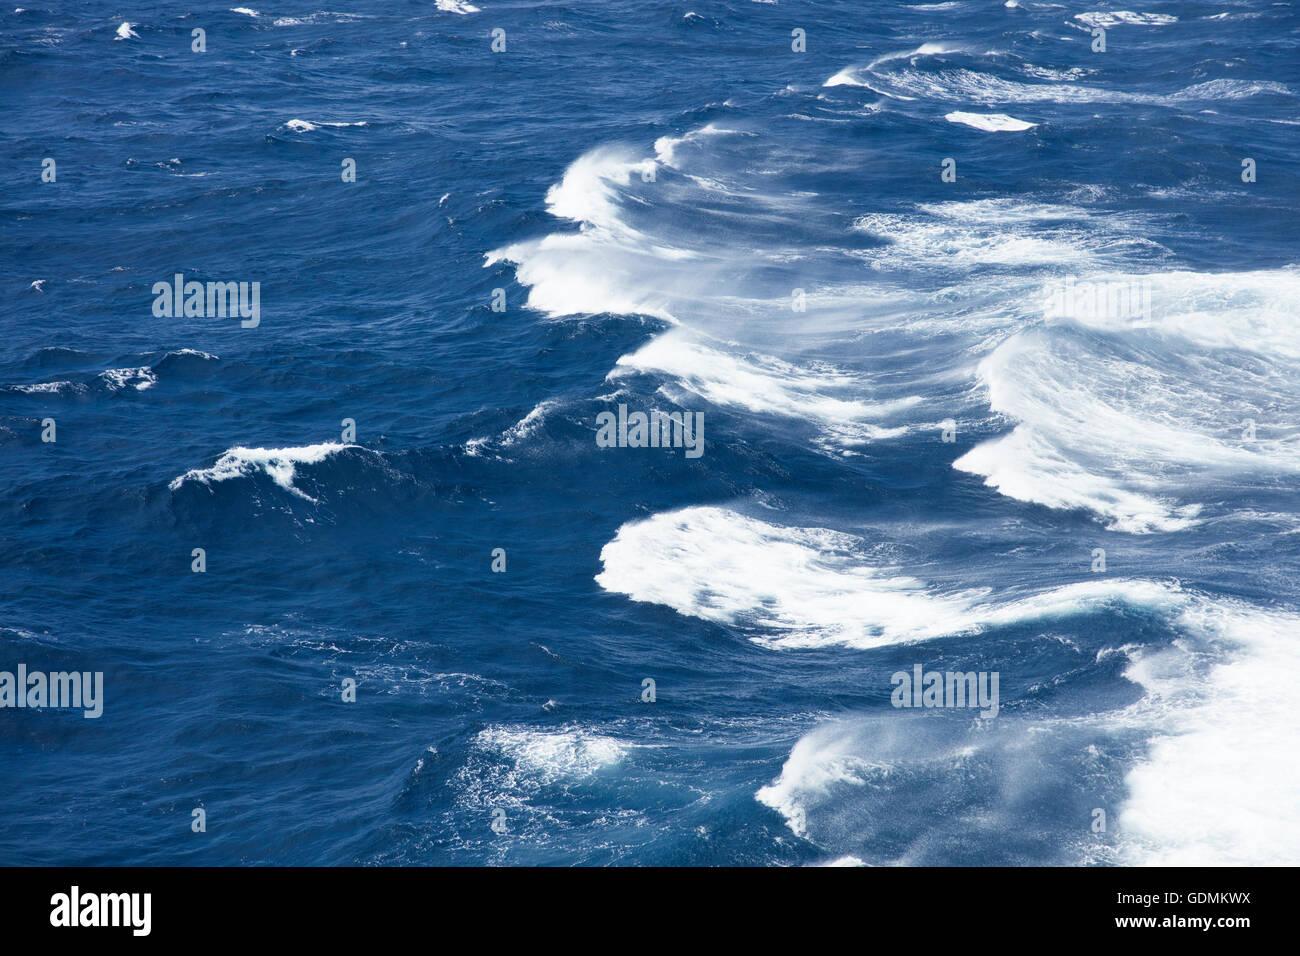 Sunshine on rough seas in the mid Atlantic Ocean Stock Photo